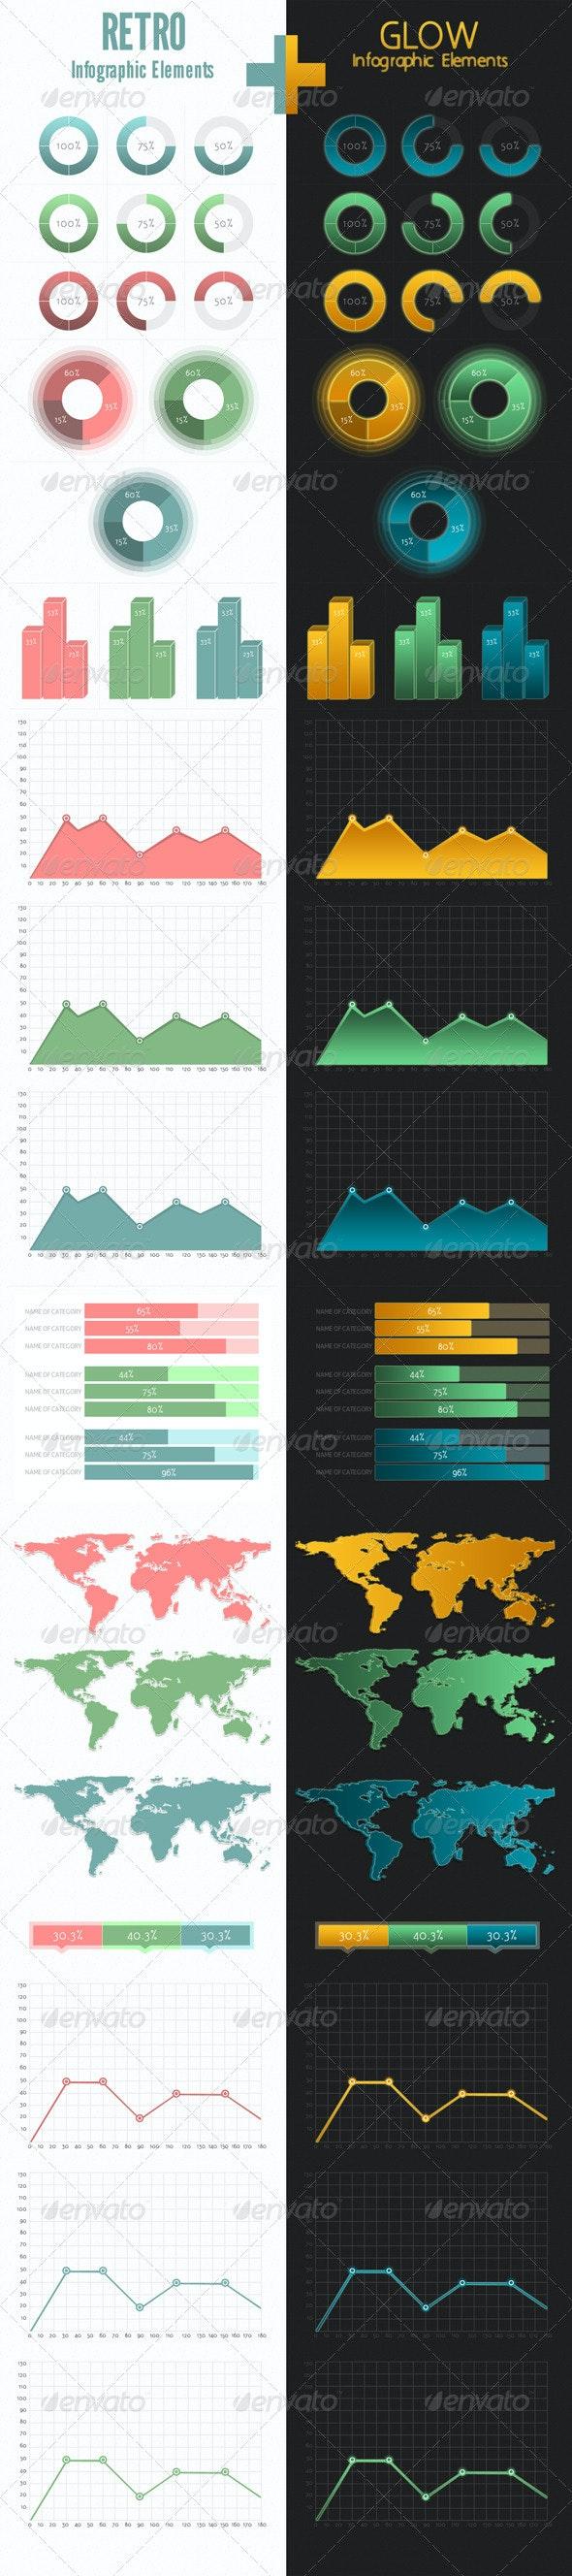 Retro+Glow Infographic - Miscellaneous Web Elements